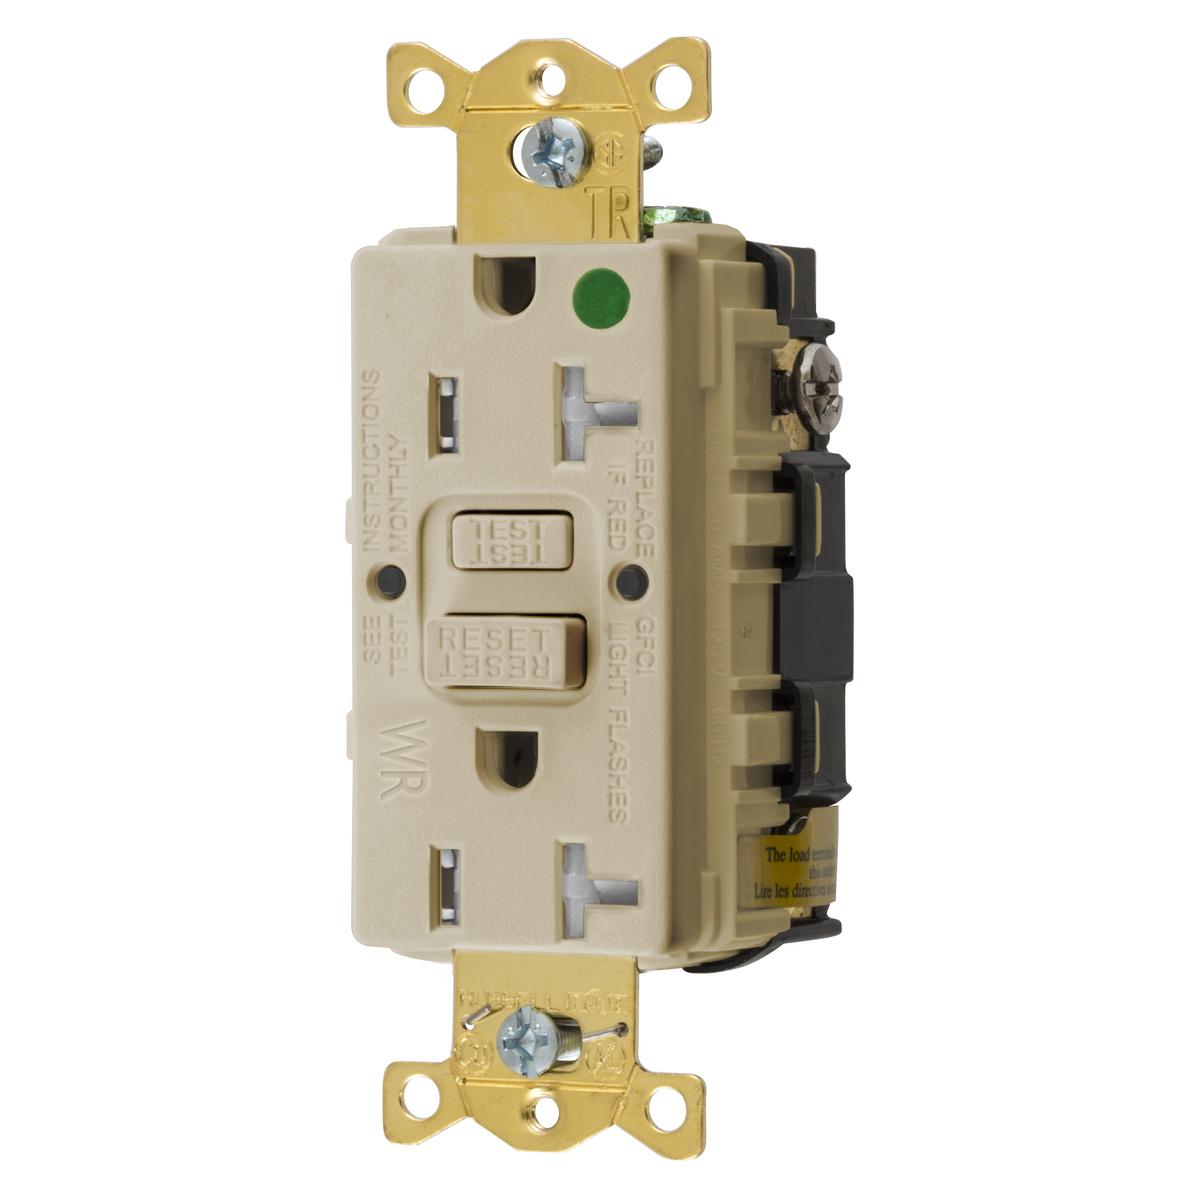 Wiring Device-KellemsGFTWRST83I